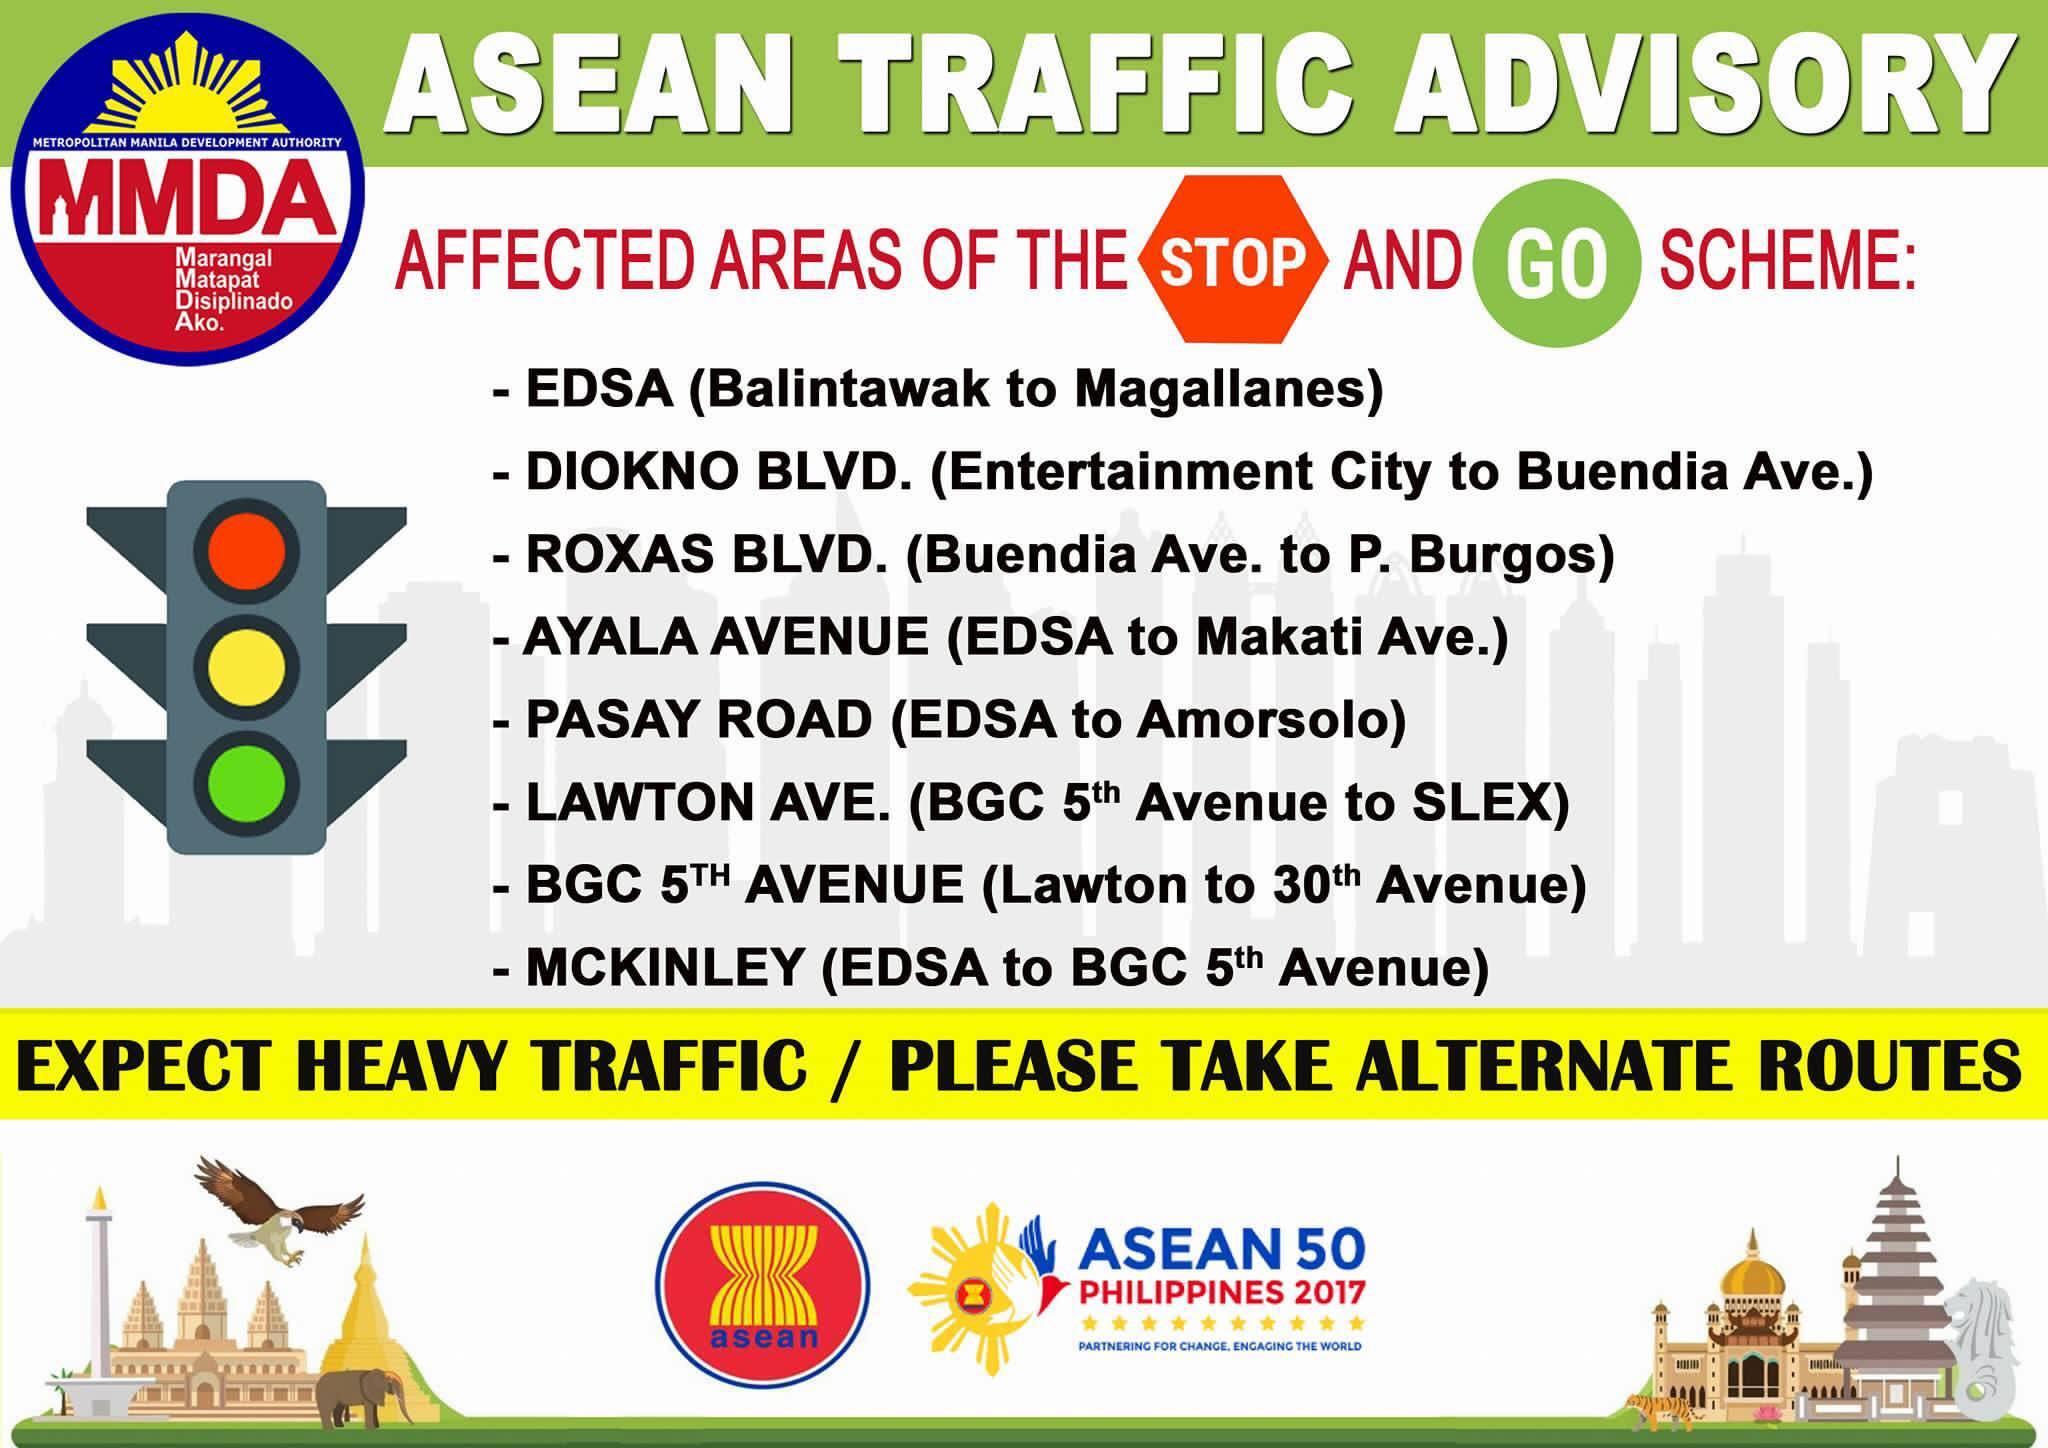 asean traffic advisory